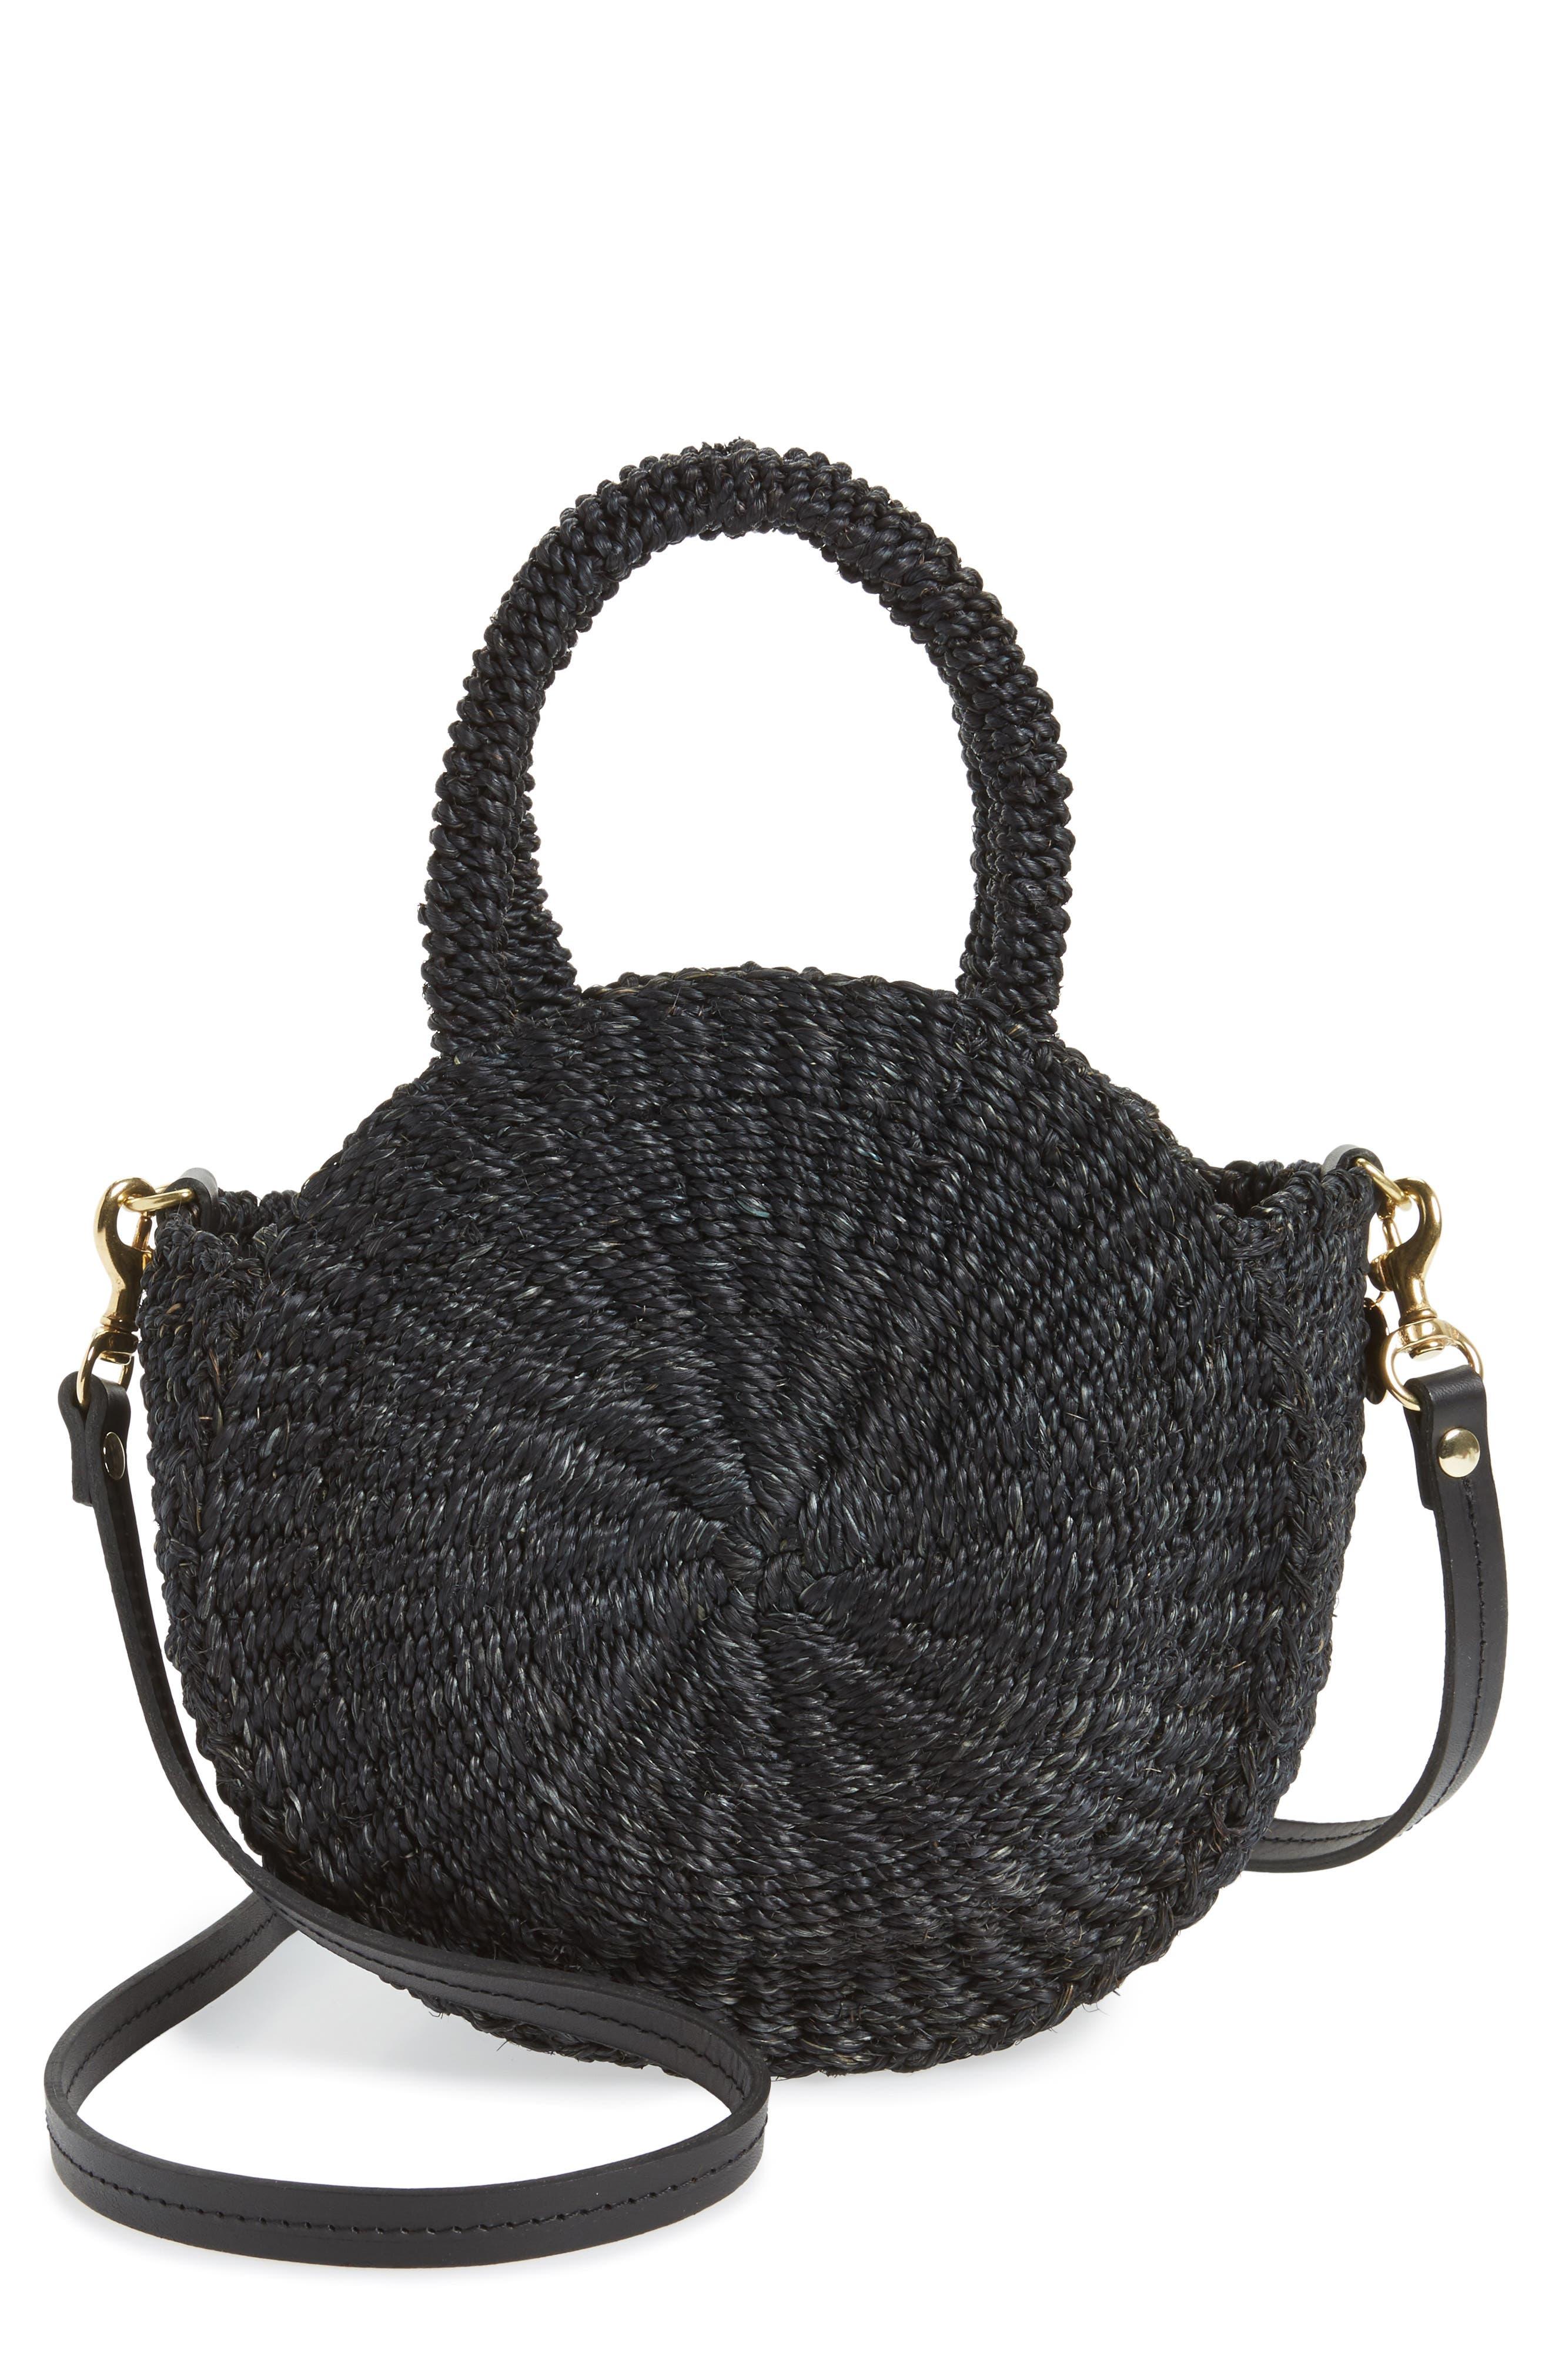 Petite Alice Straw Bag,                         Main,                         color, BLACK WOVEN